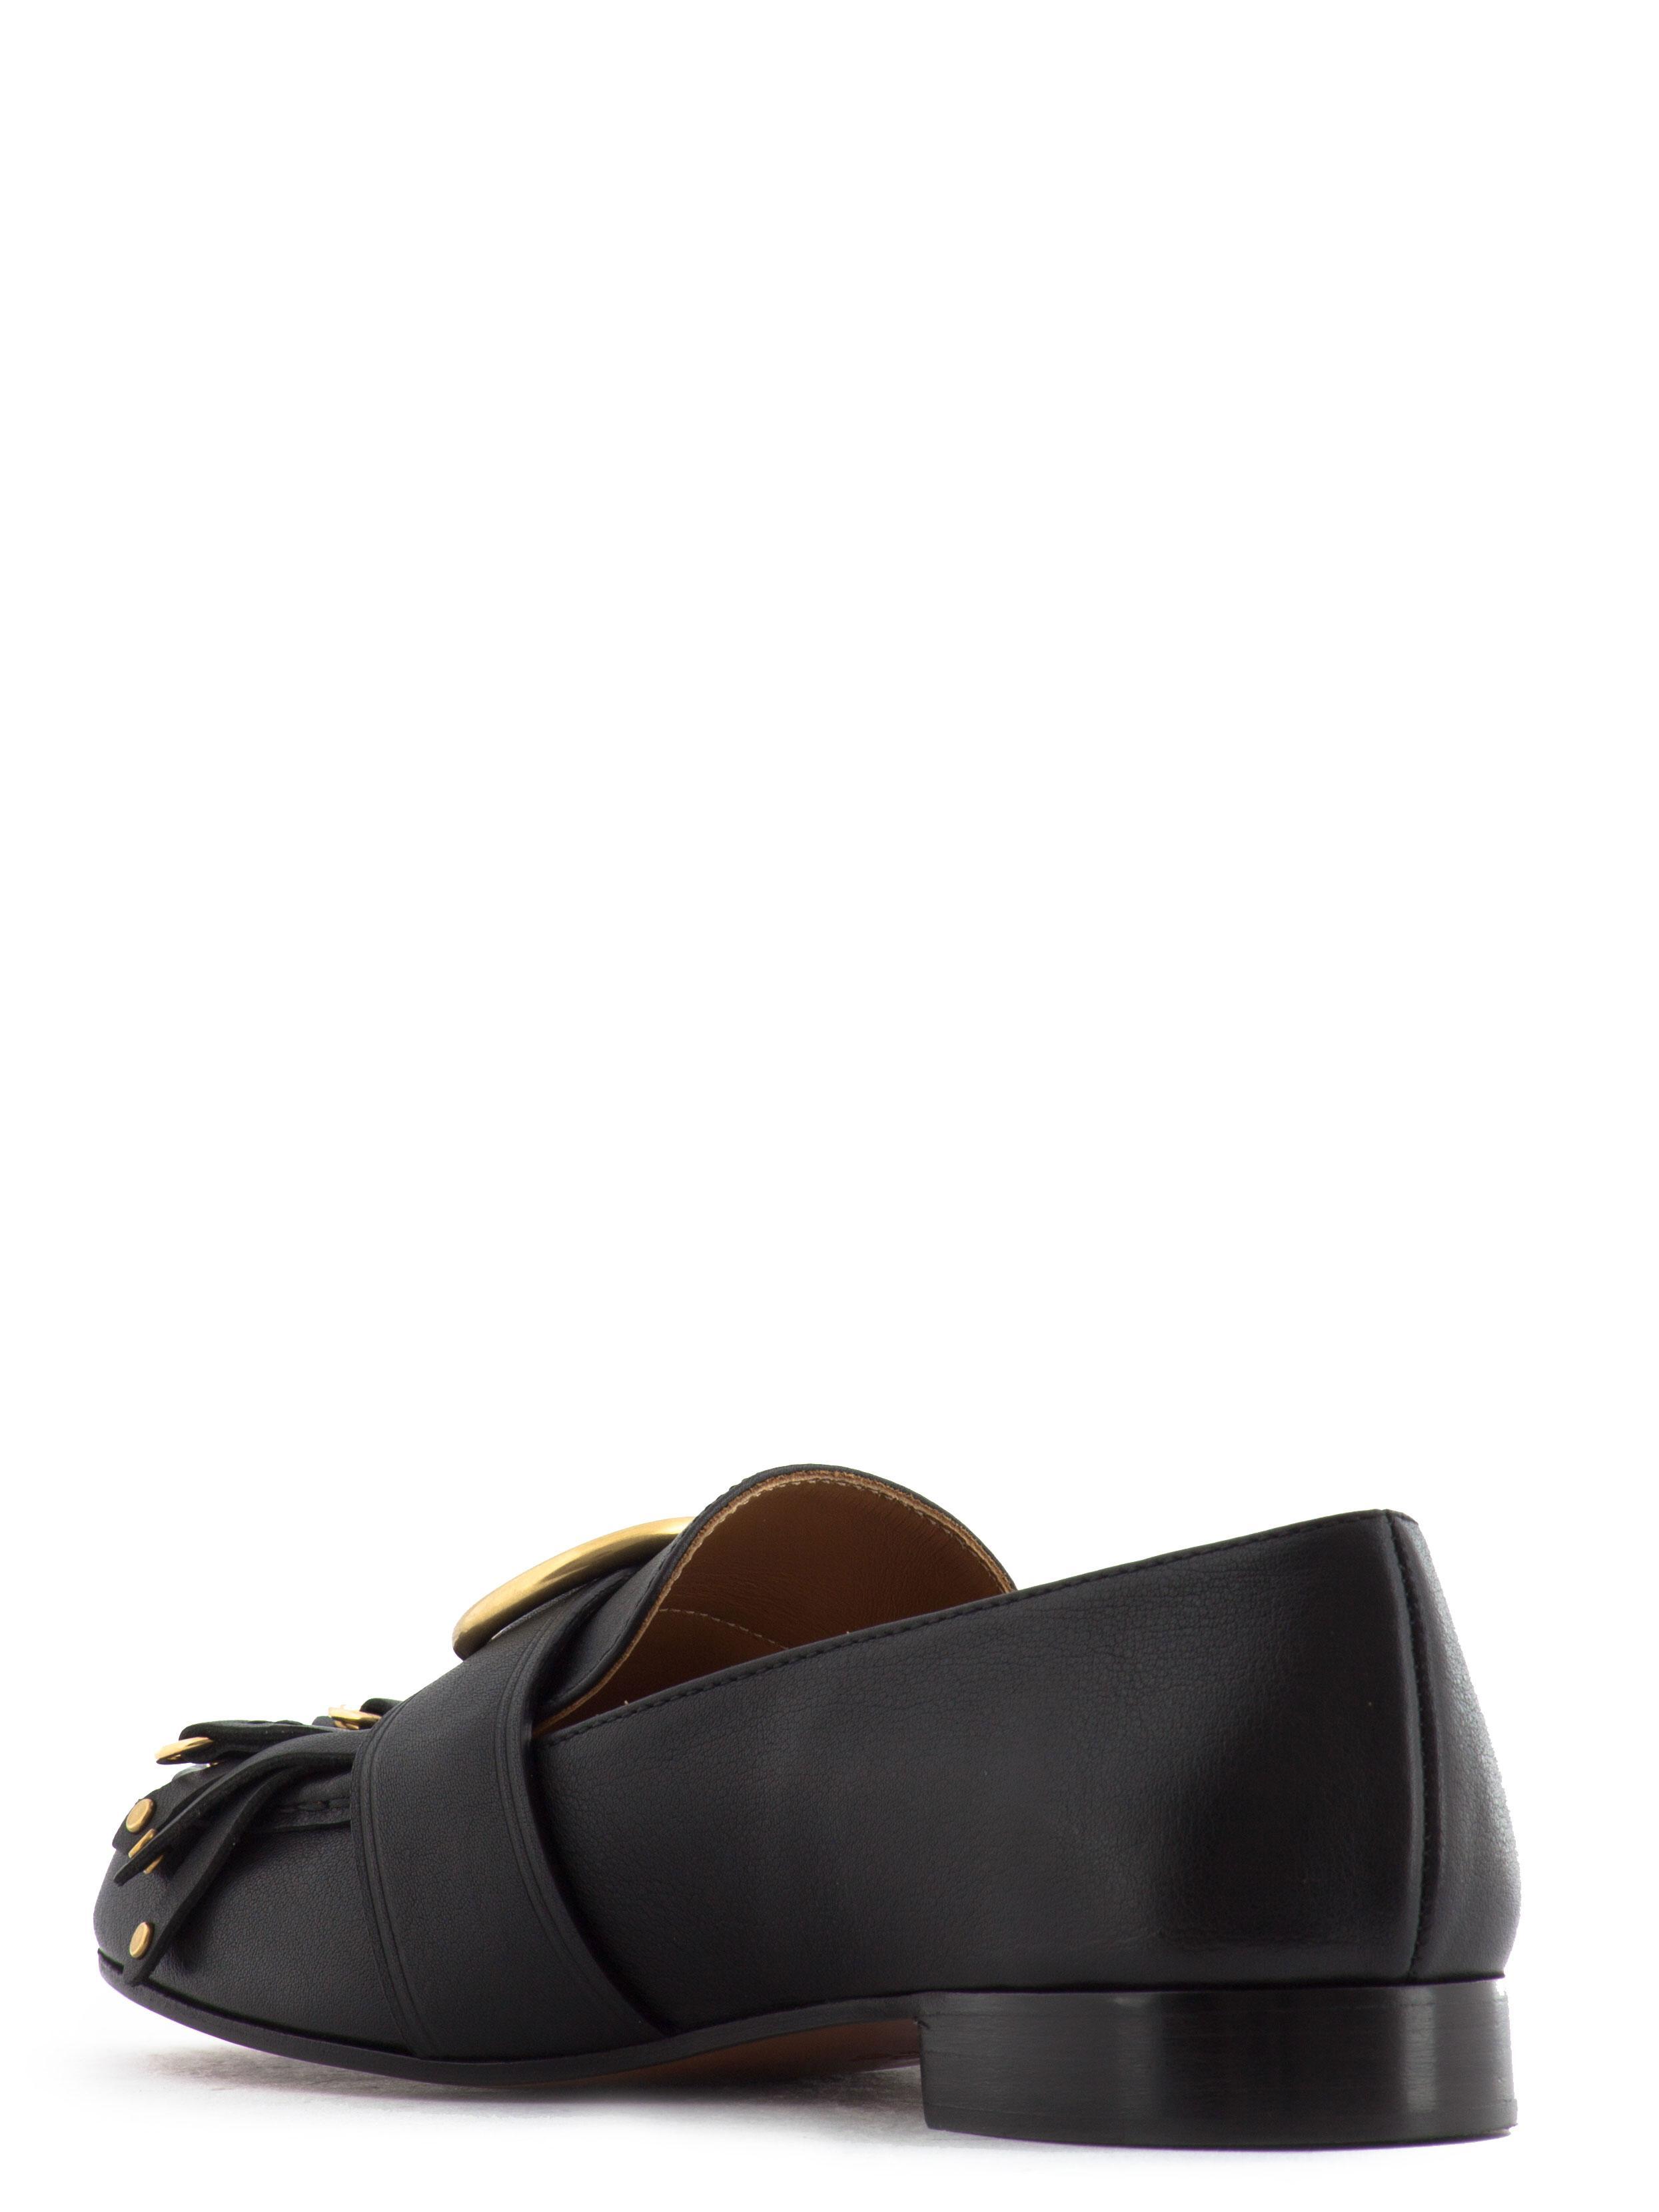 Chloé Black Nocturnal Loafers upfLq7u